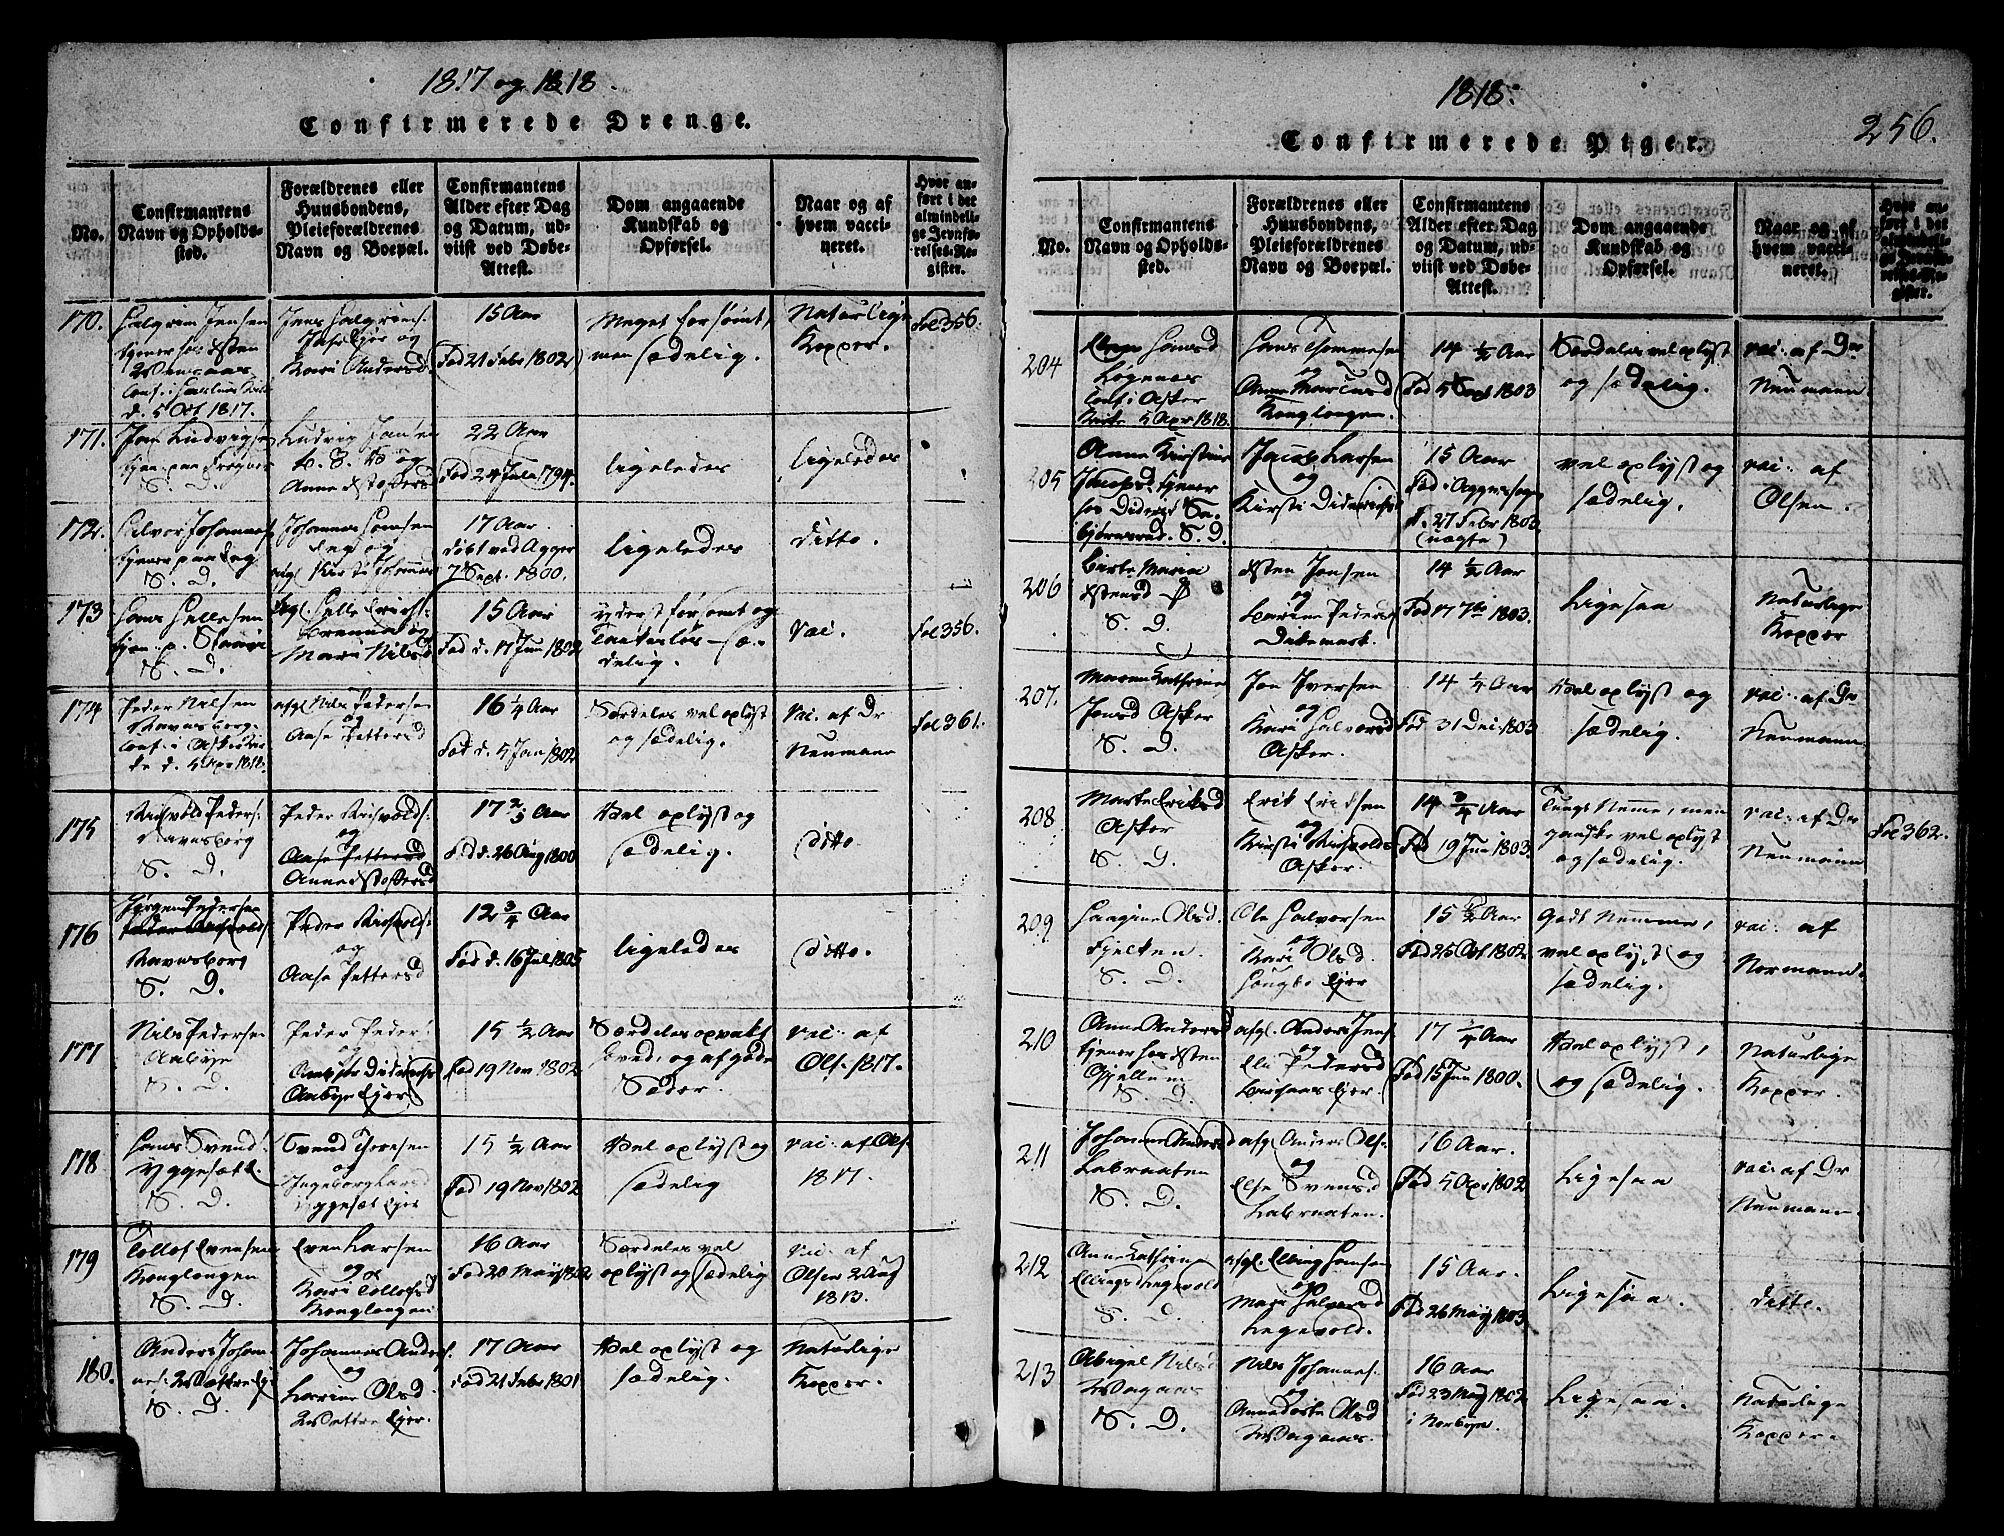 SAO, Asker prestekontor Kirkebøker, G/Ga/L0001: Klokkerbok nr. I 1, 1814-1830, s. 256